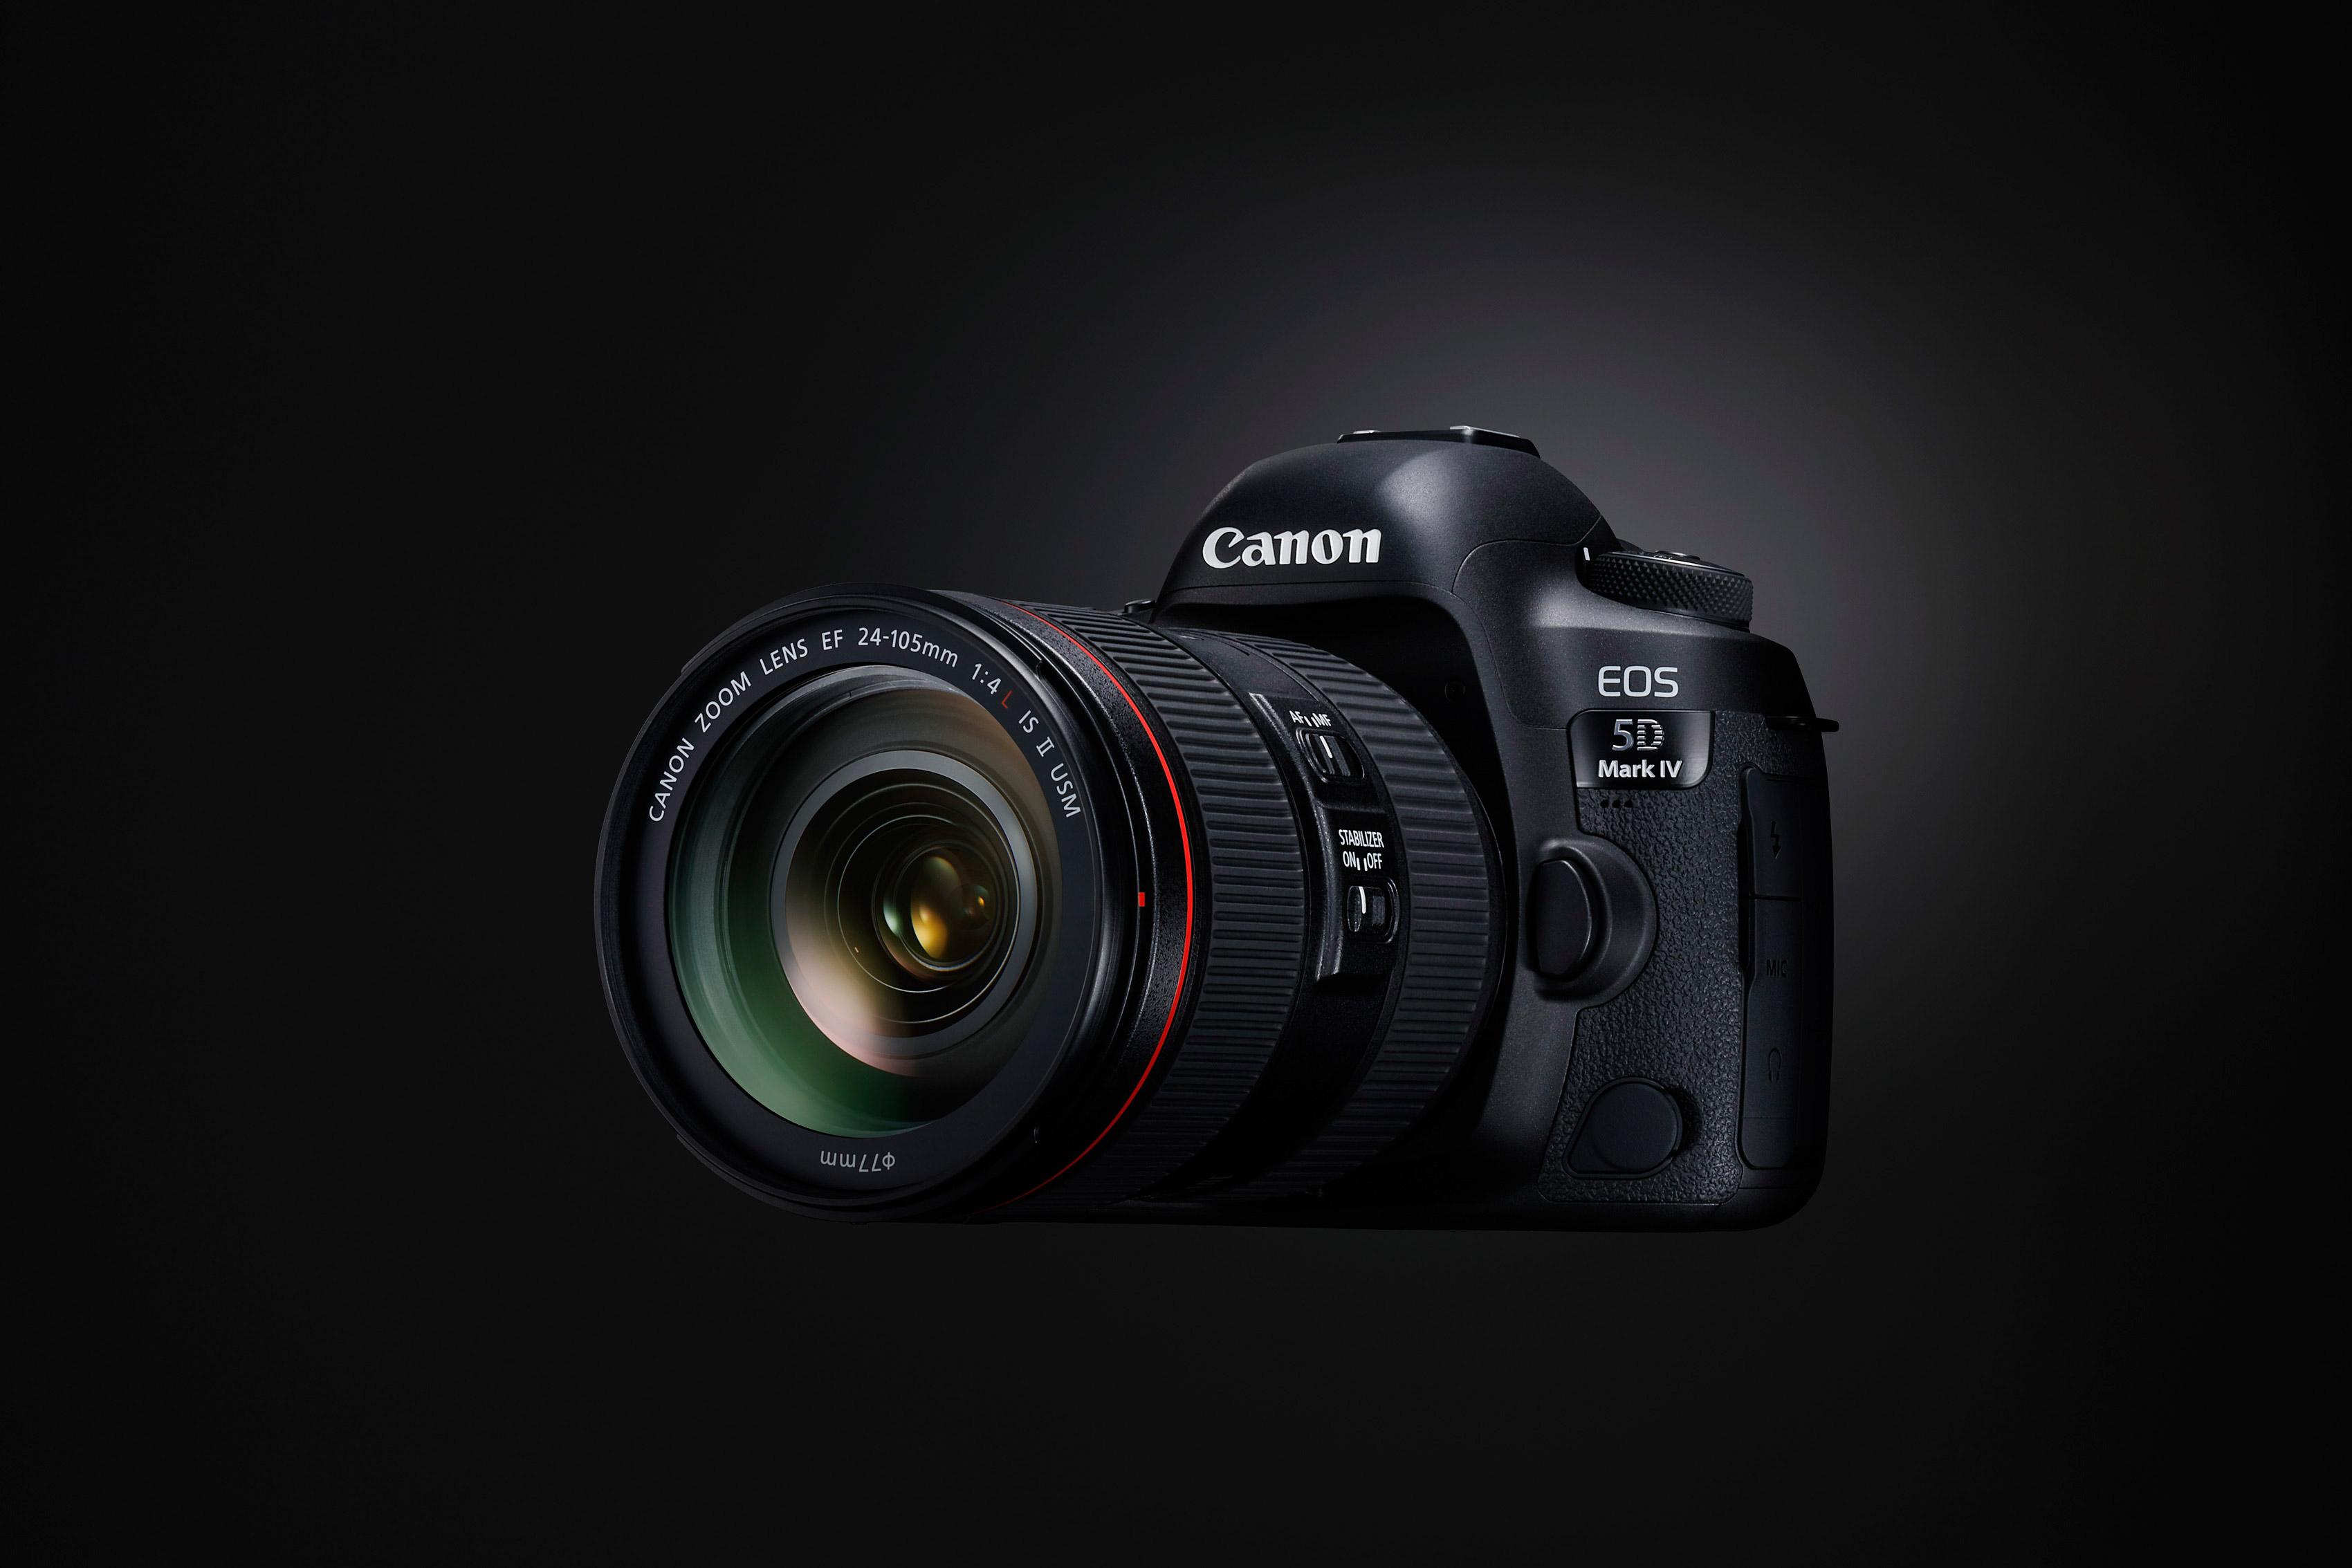 Canon EOS 5D Mark IV DSLR Body DSLR Cameras 1483C003 - Vistek Canada Product Detail